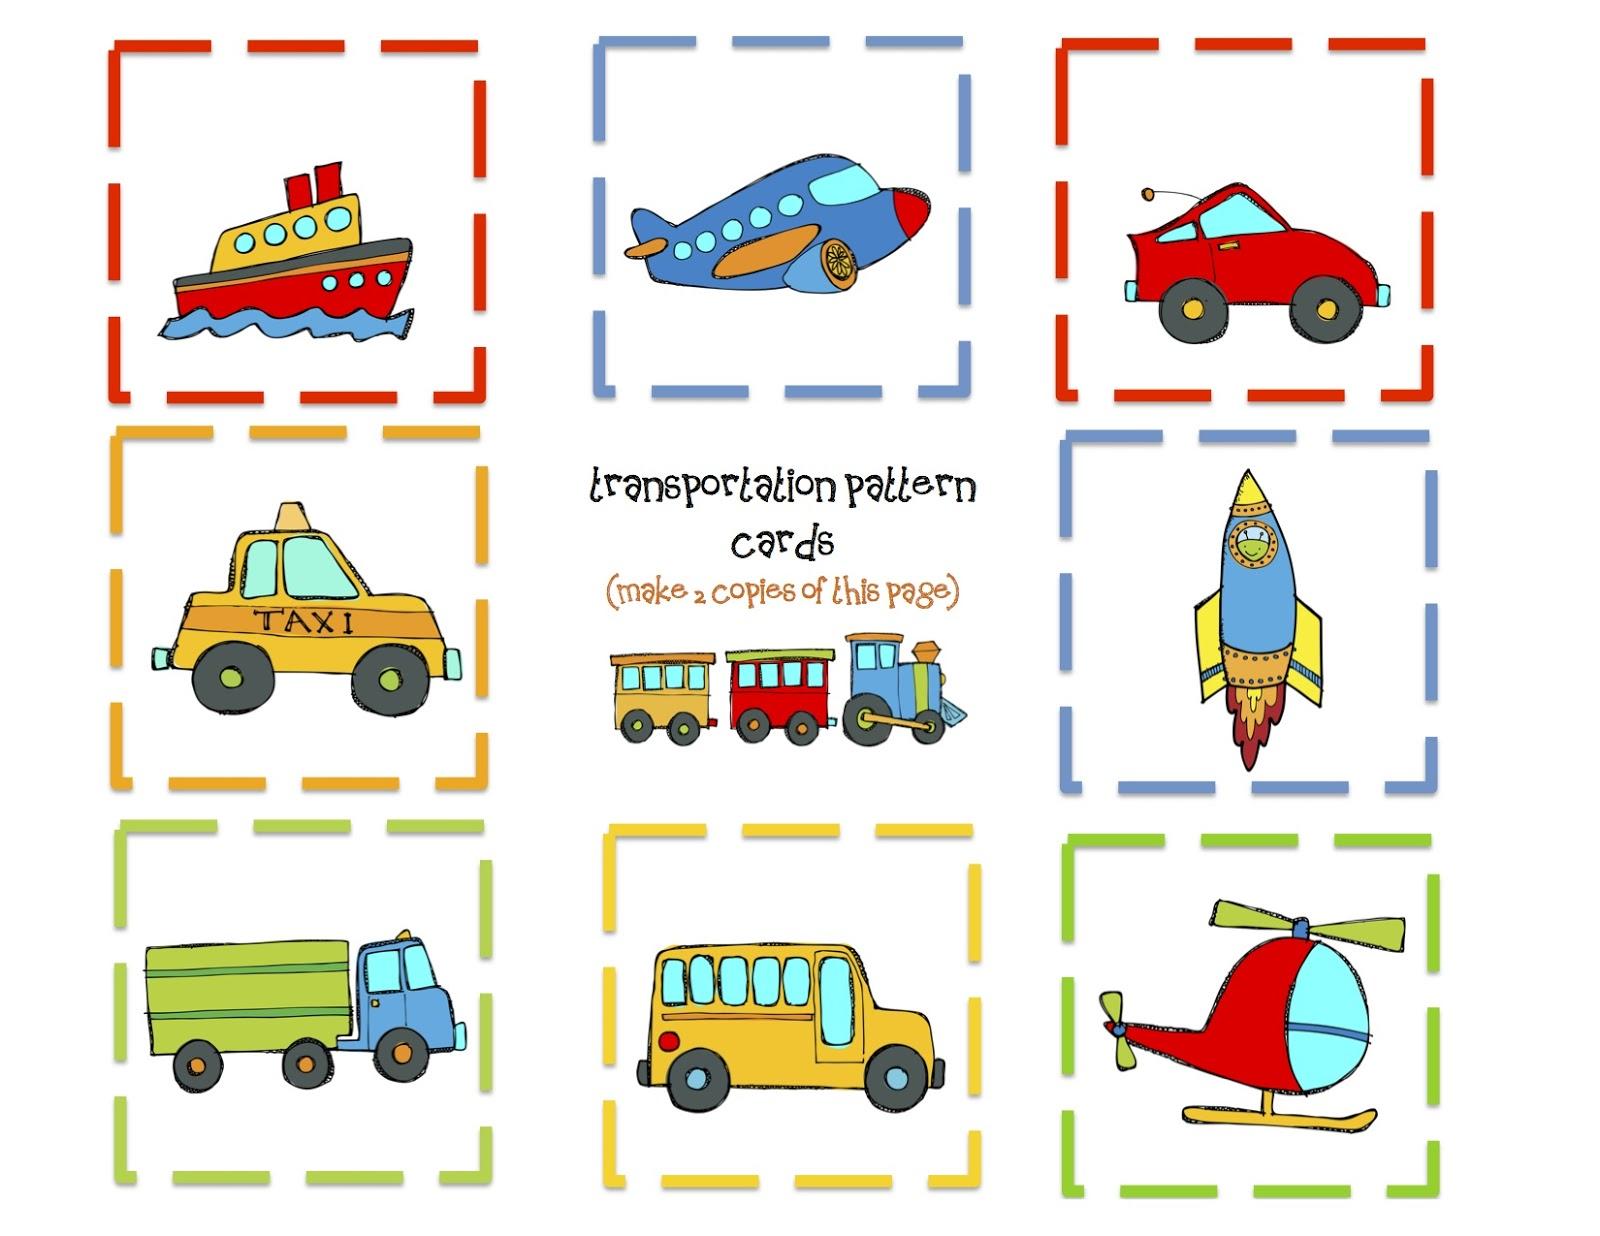 Transportation 9 Pattern Cards